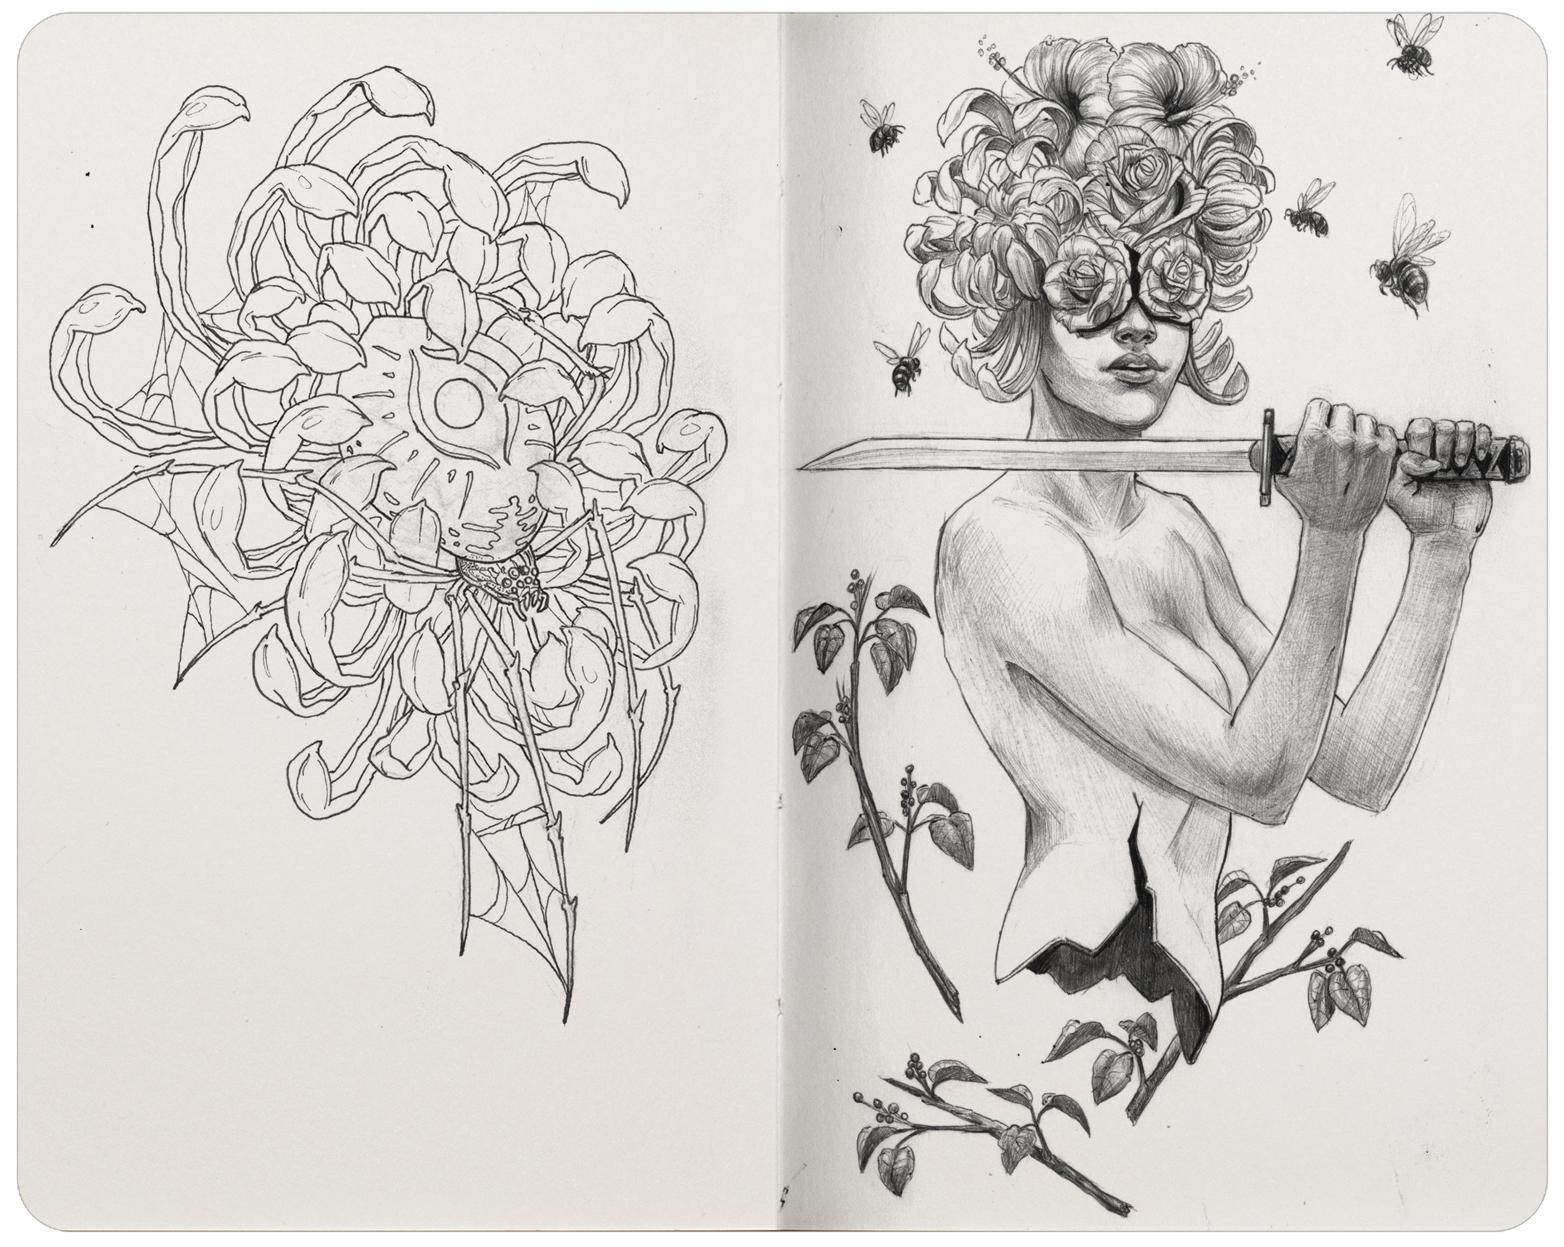 Left: Pigma Micron pen. Right: Ballpoint pen.